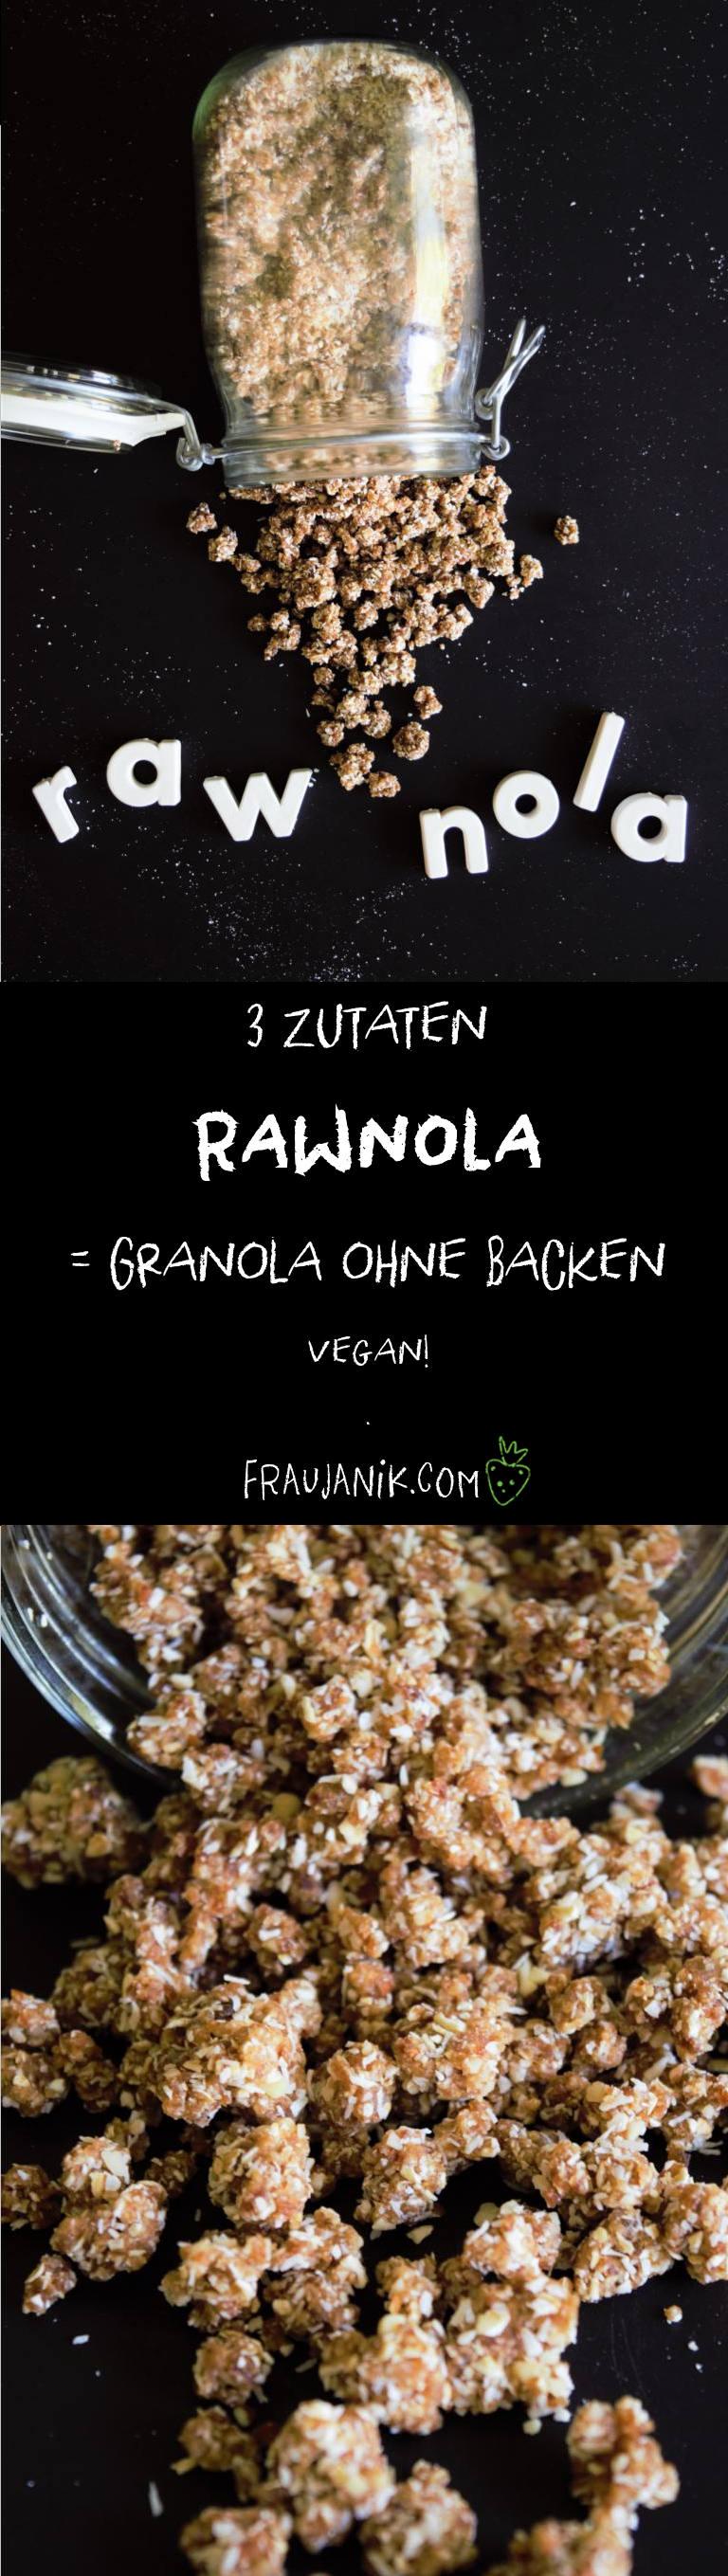 Rawnola, Granola ohne Backen